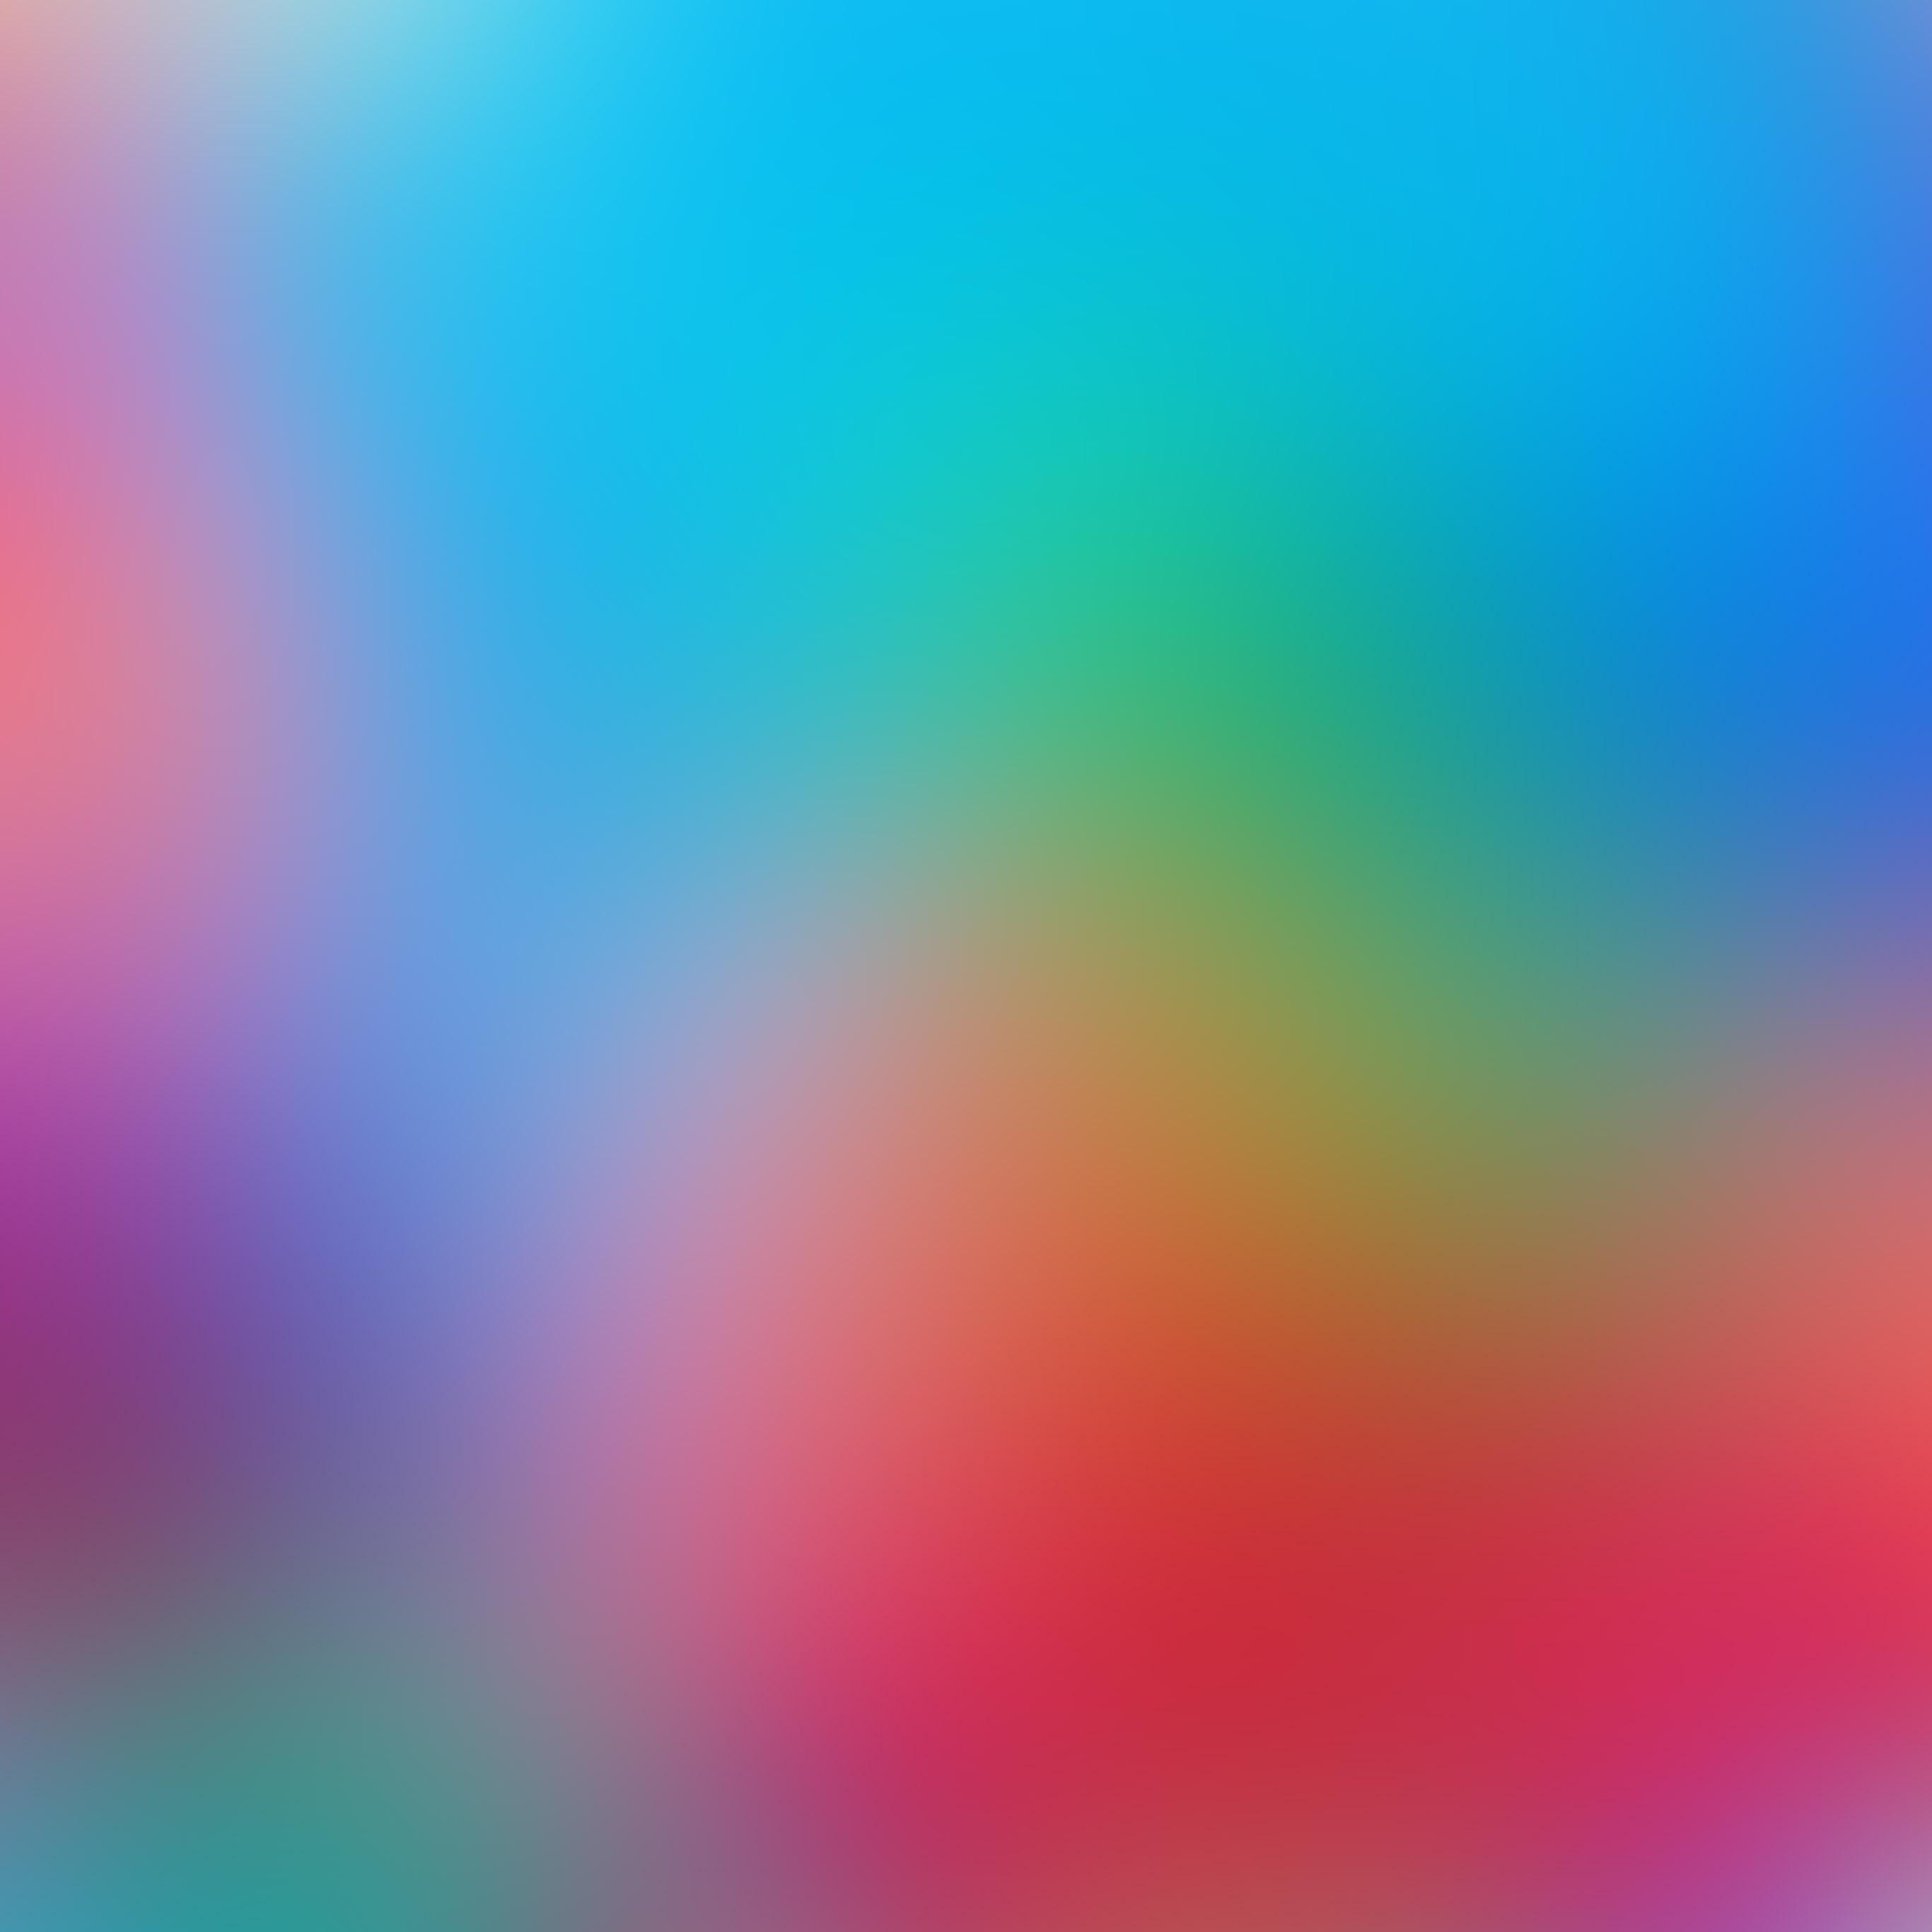 color gradation coloring pages - photo#26